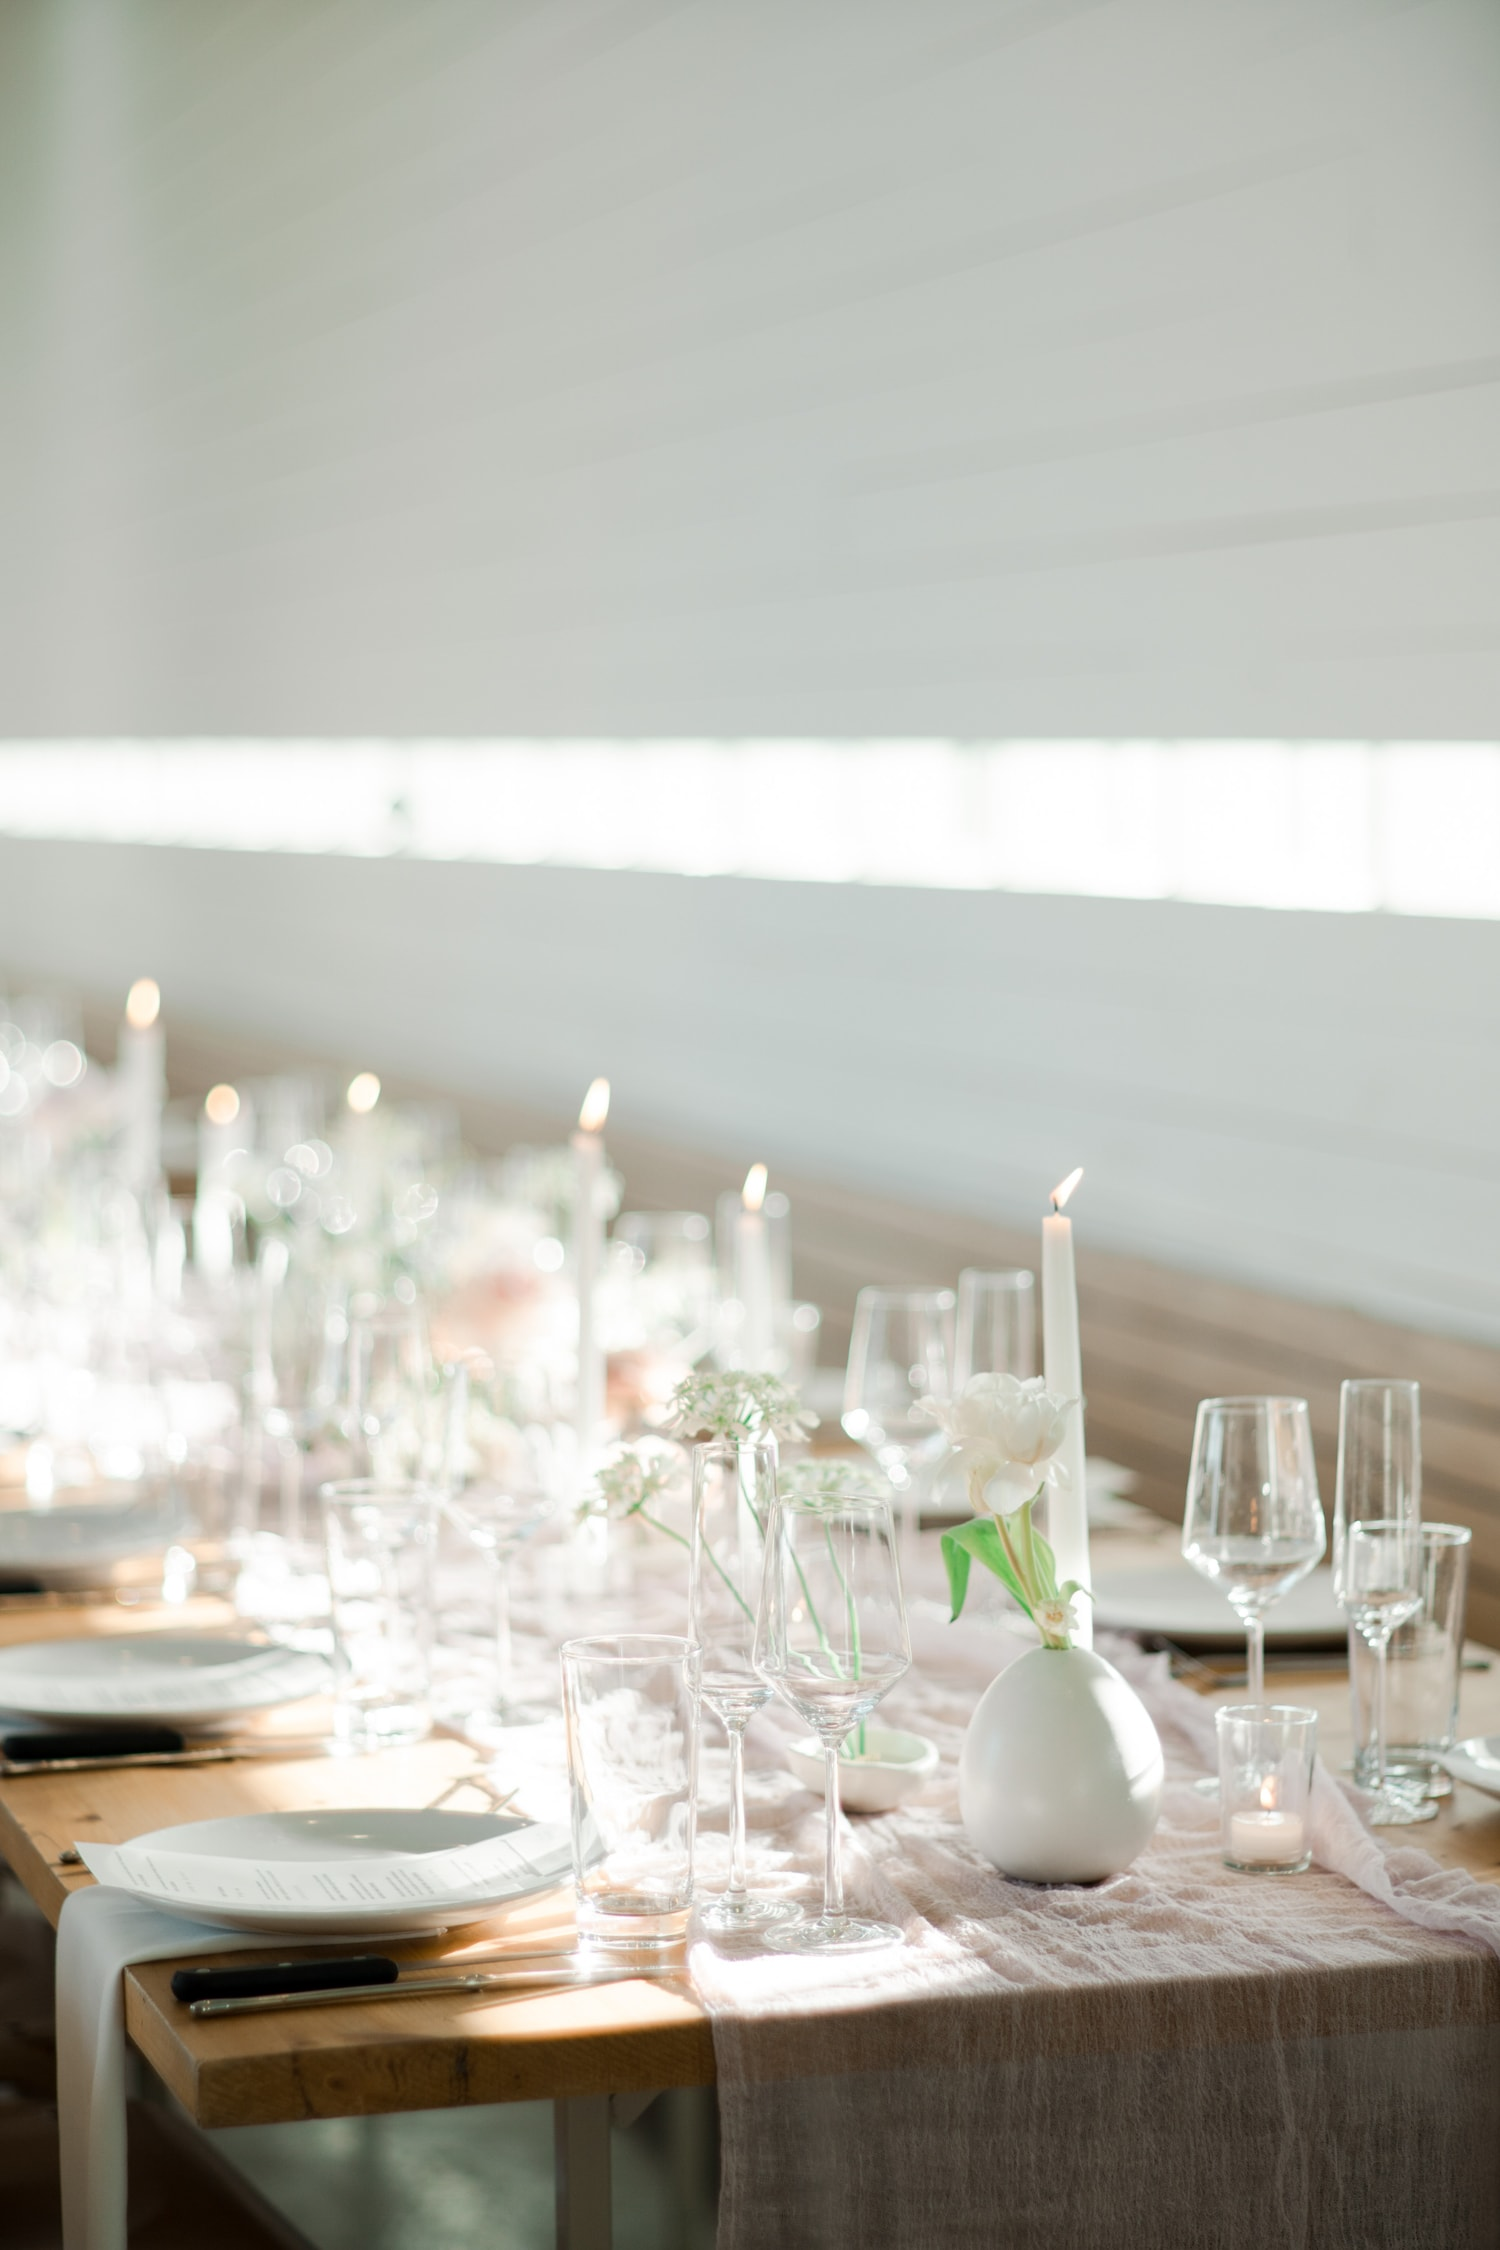 PROSPECT_HOUSE_WEDDING_AUSTIN_TX_MATTHEW_MOORE-00622.jpg